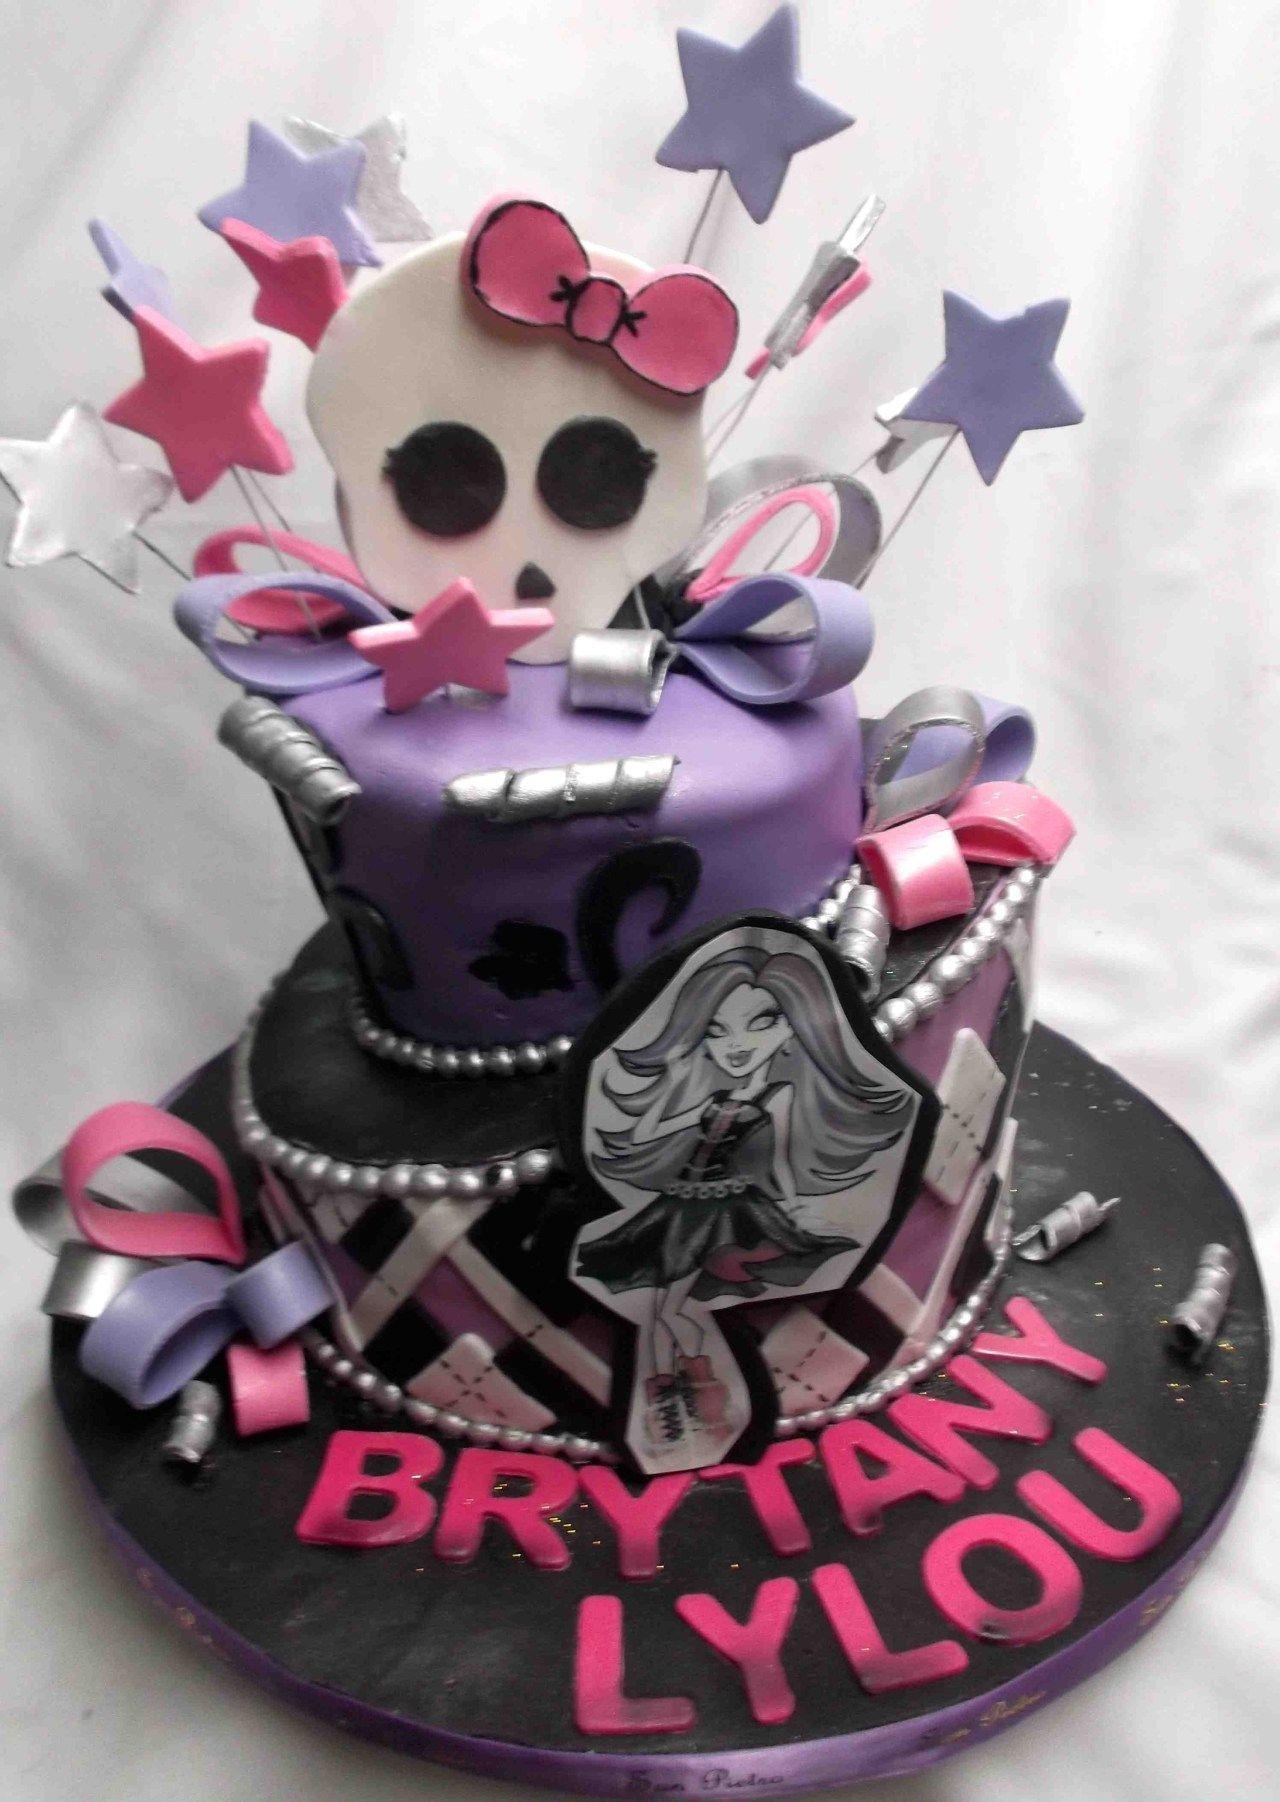 Enjoyable 30 Best Photo Of Skull Birthday Cake Countrydirectory Info Birthday Cards Printable Trancafe Filternl